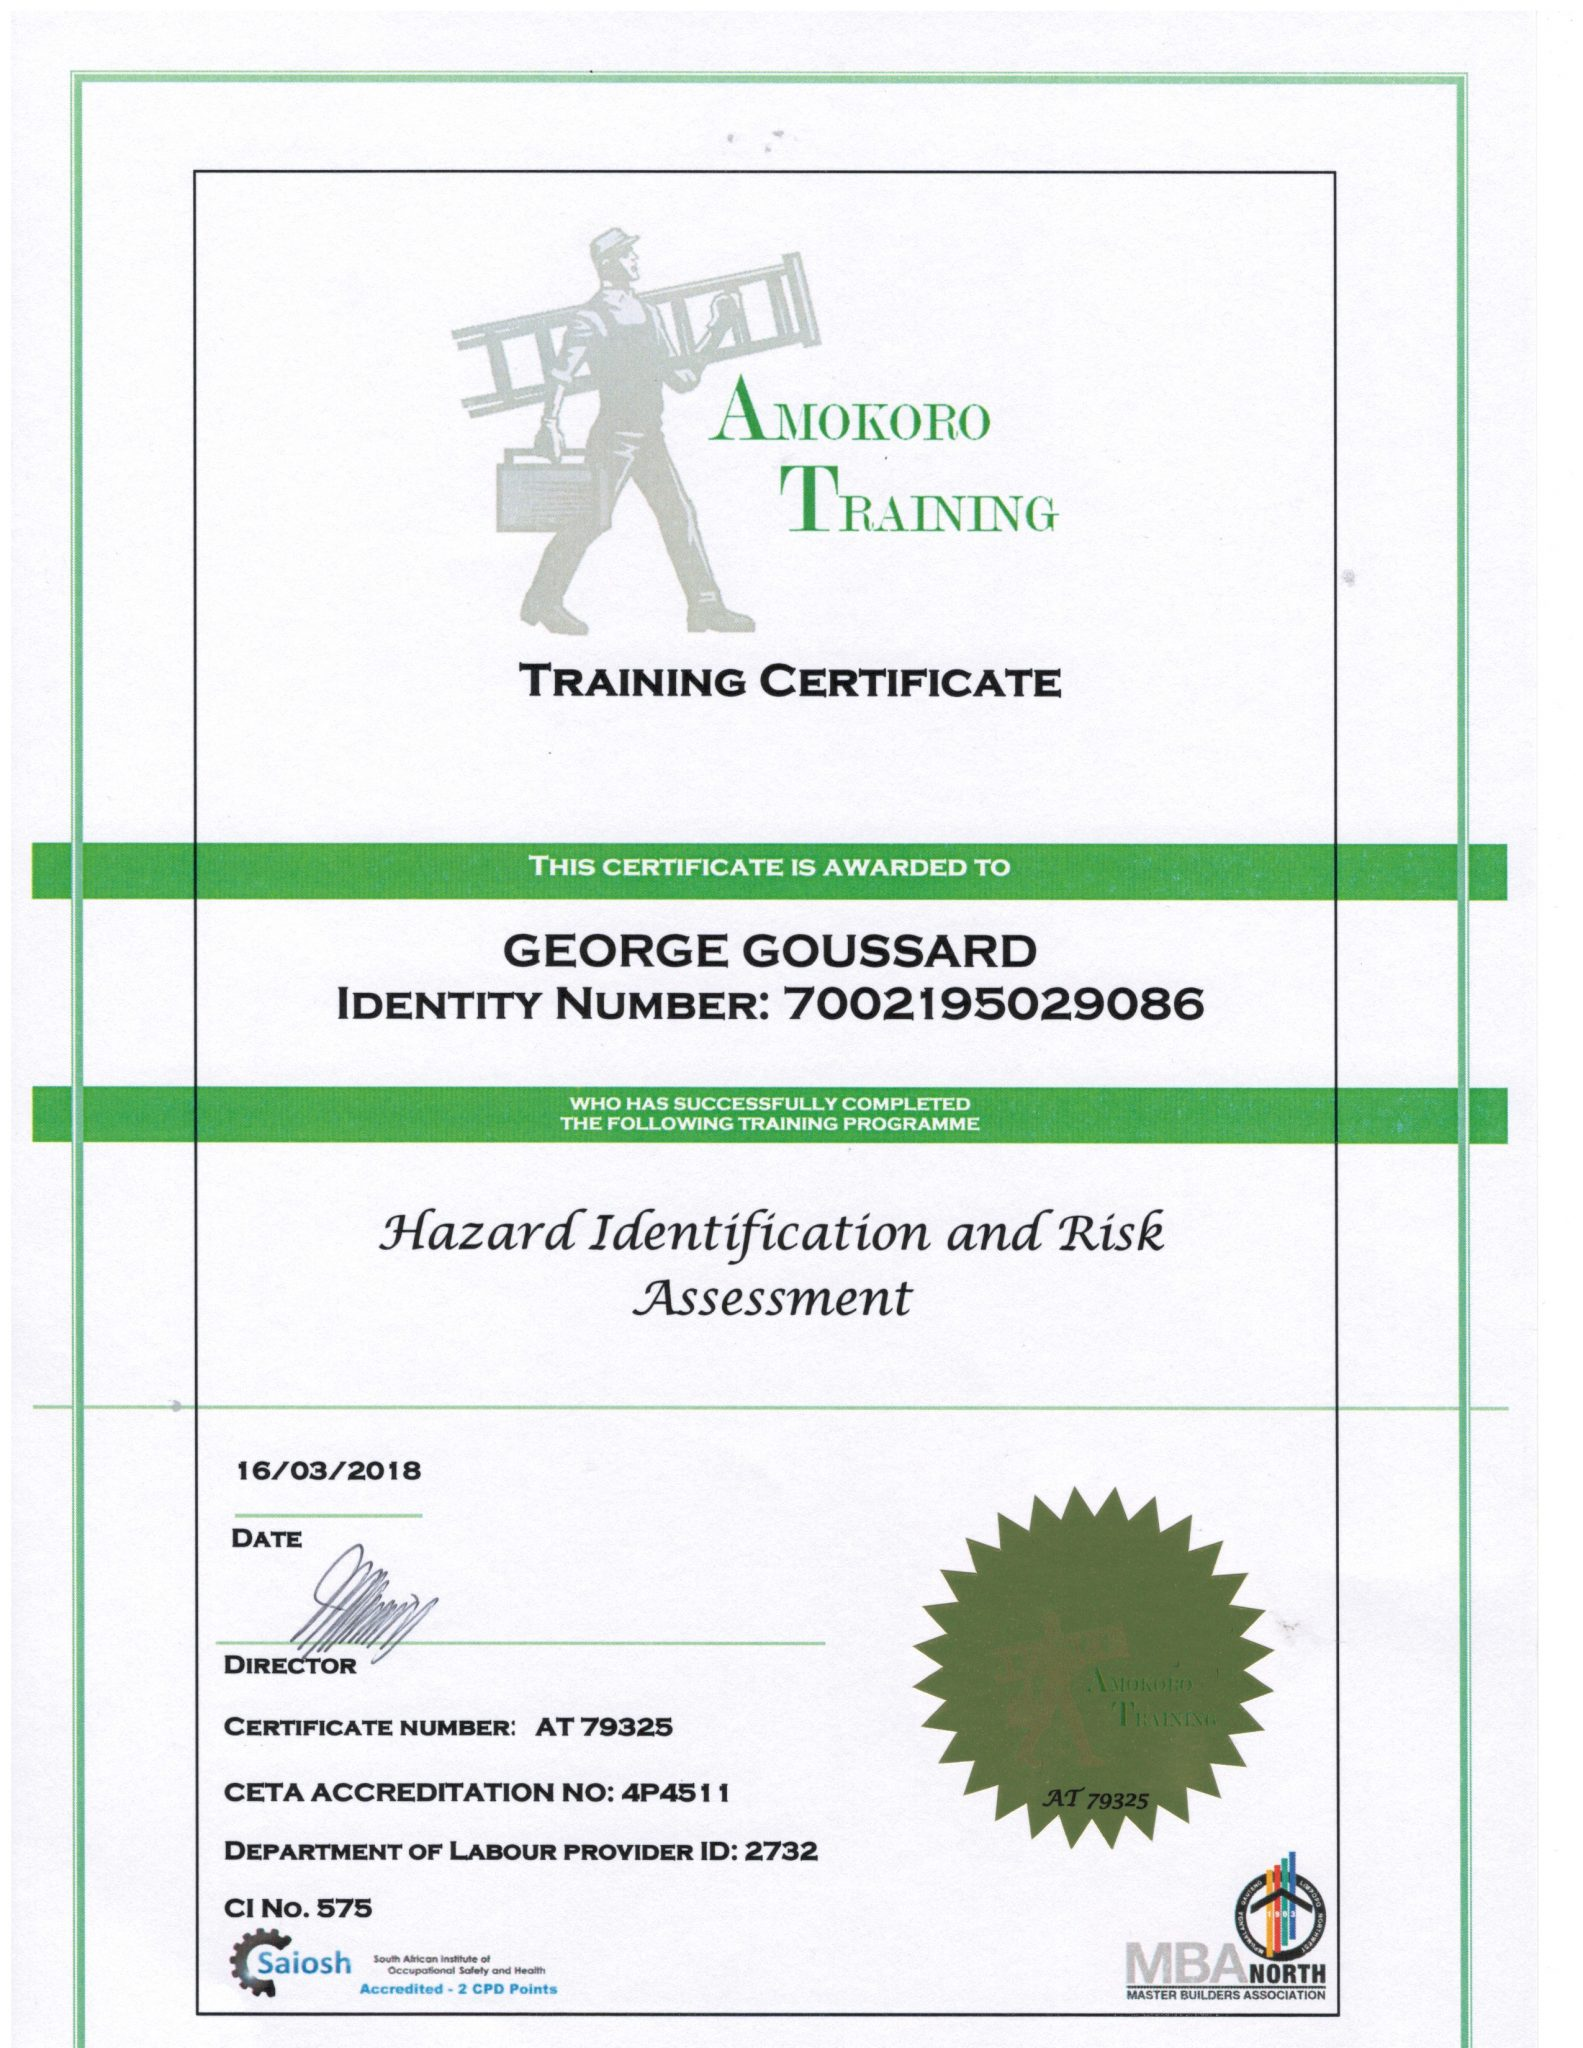 George Goussard Hazard Identification and Risk Assessment